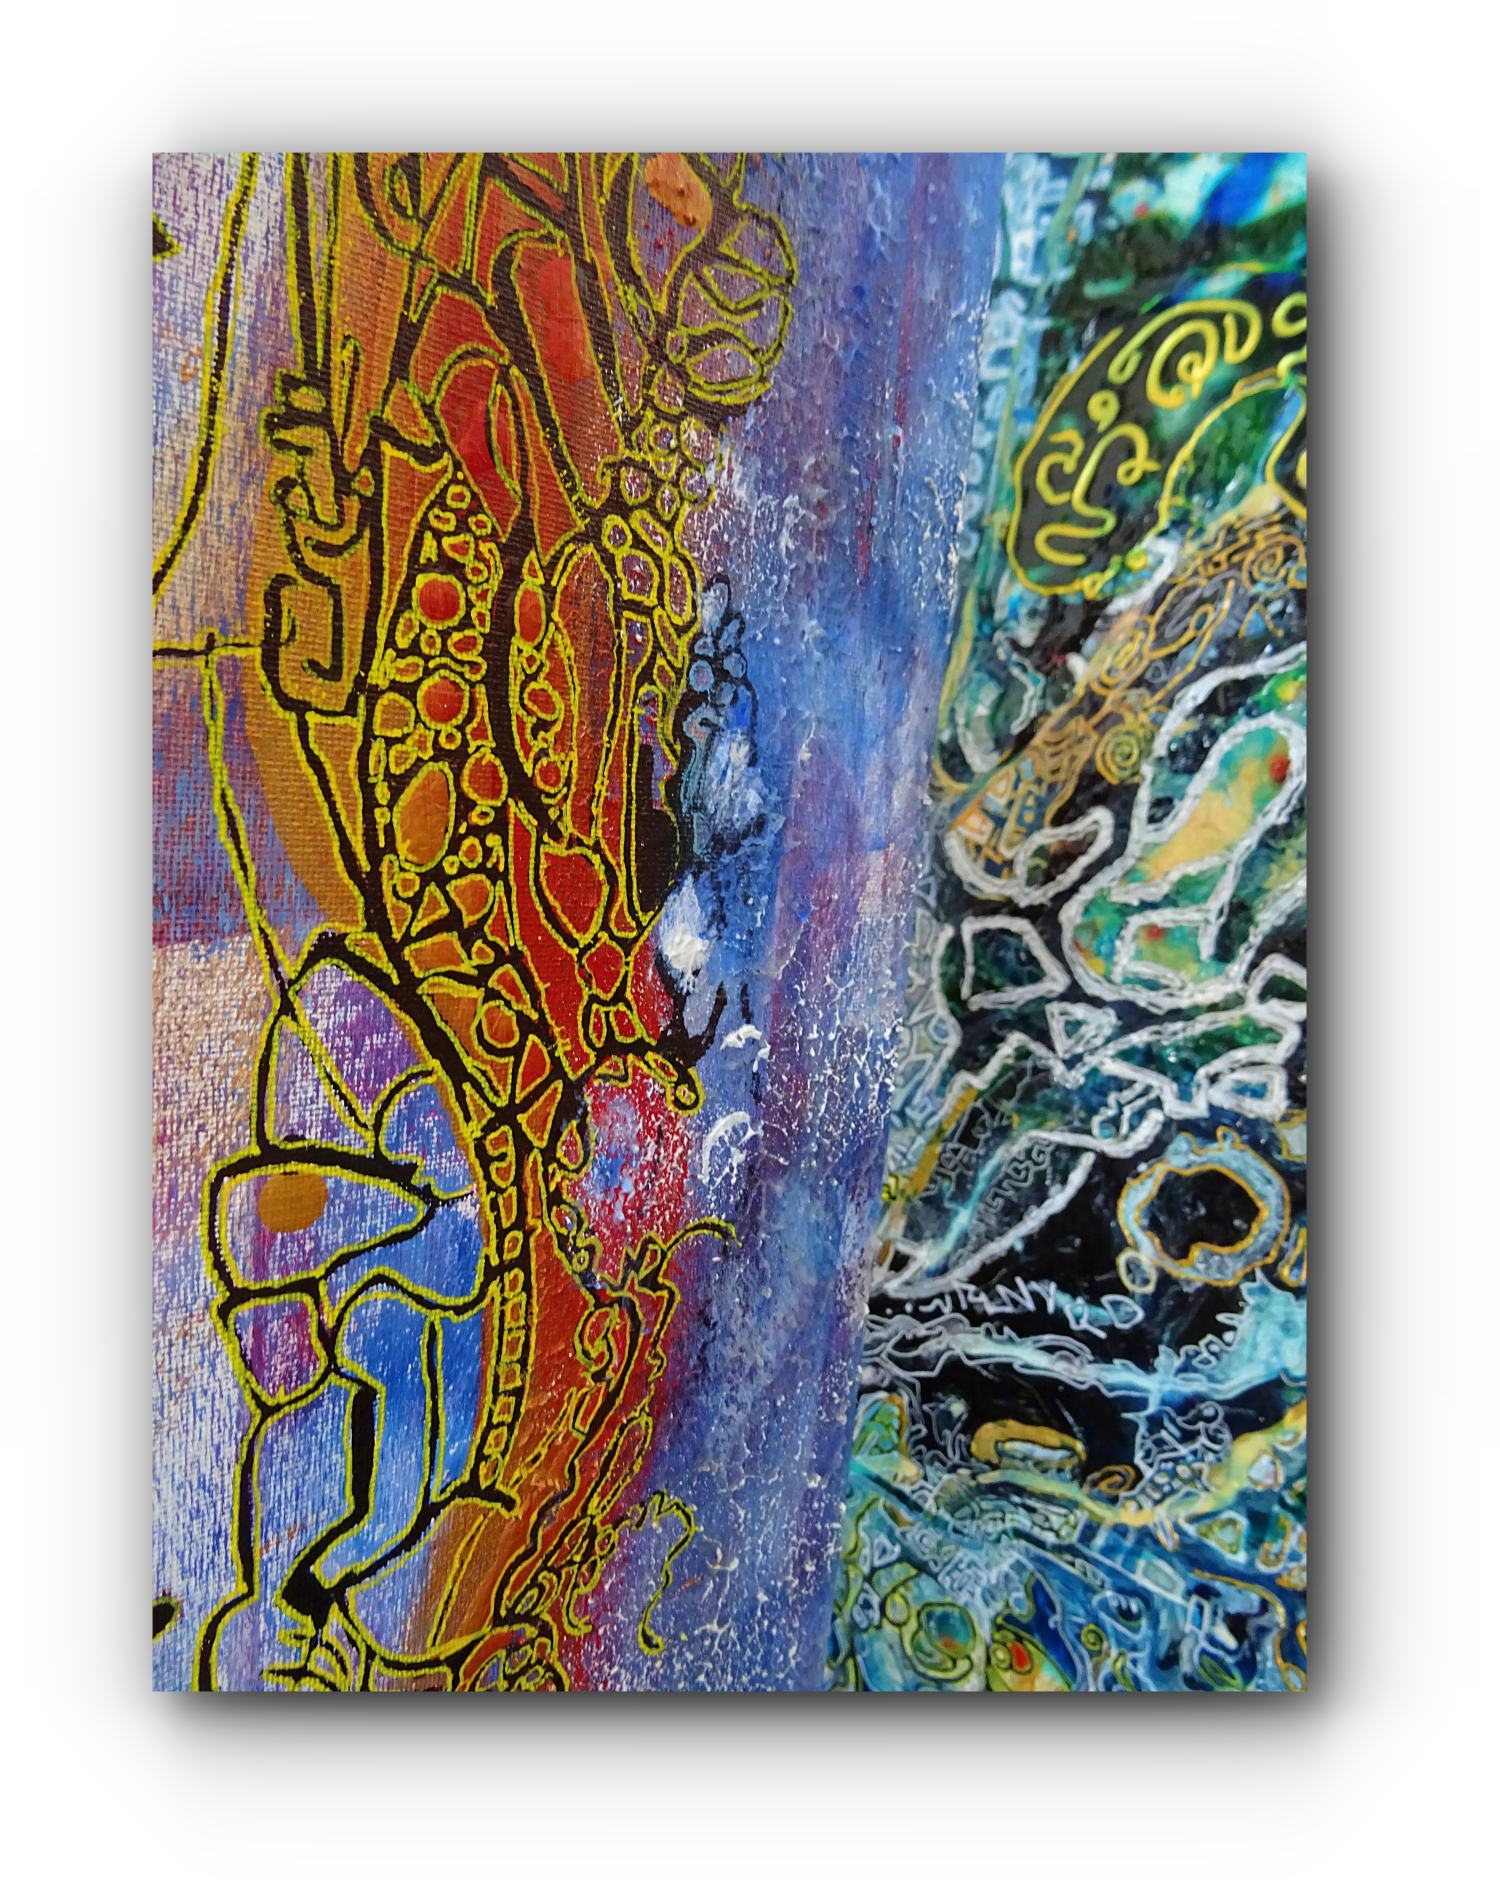 painting-innerlands-42-artist-duo-ingress-vortices.jpg